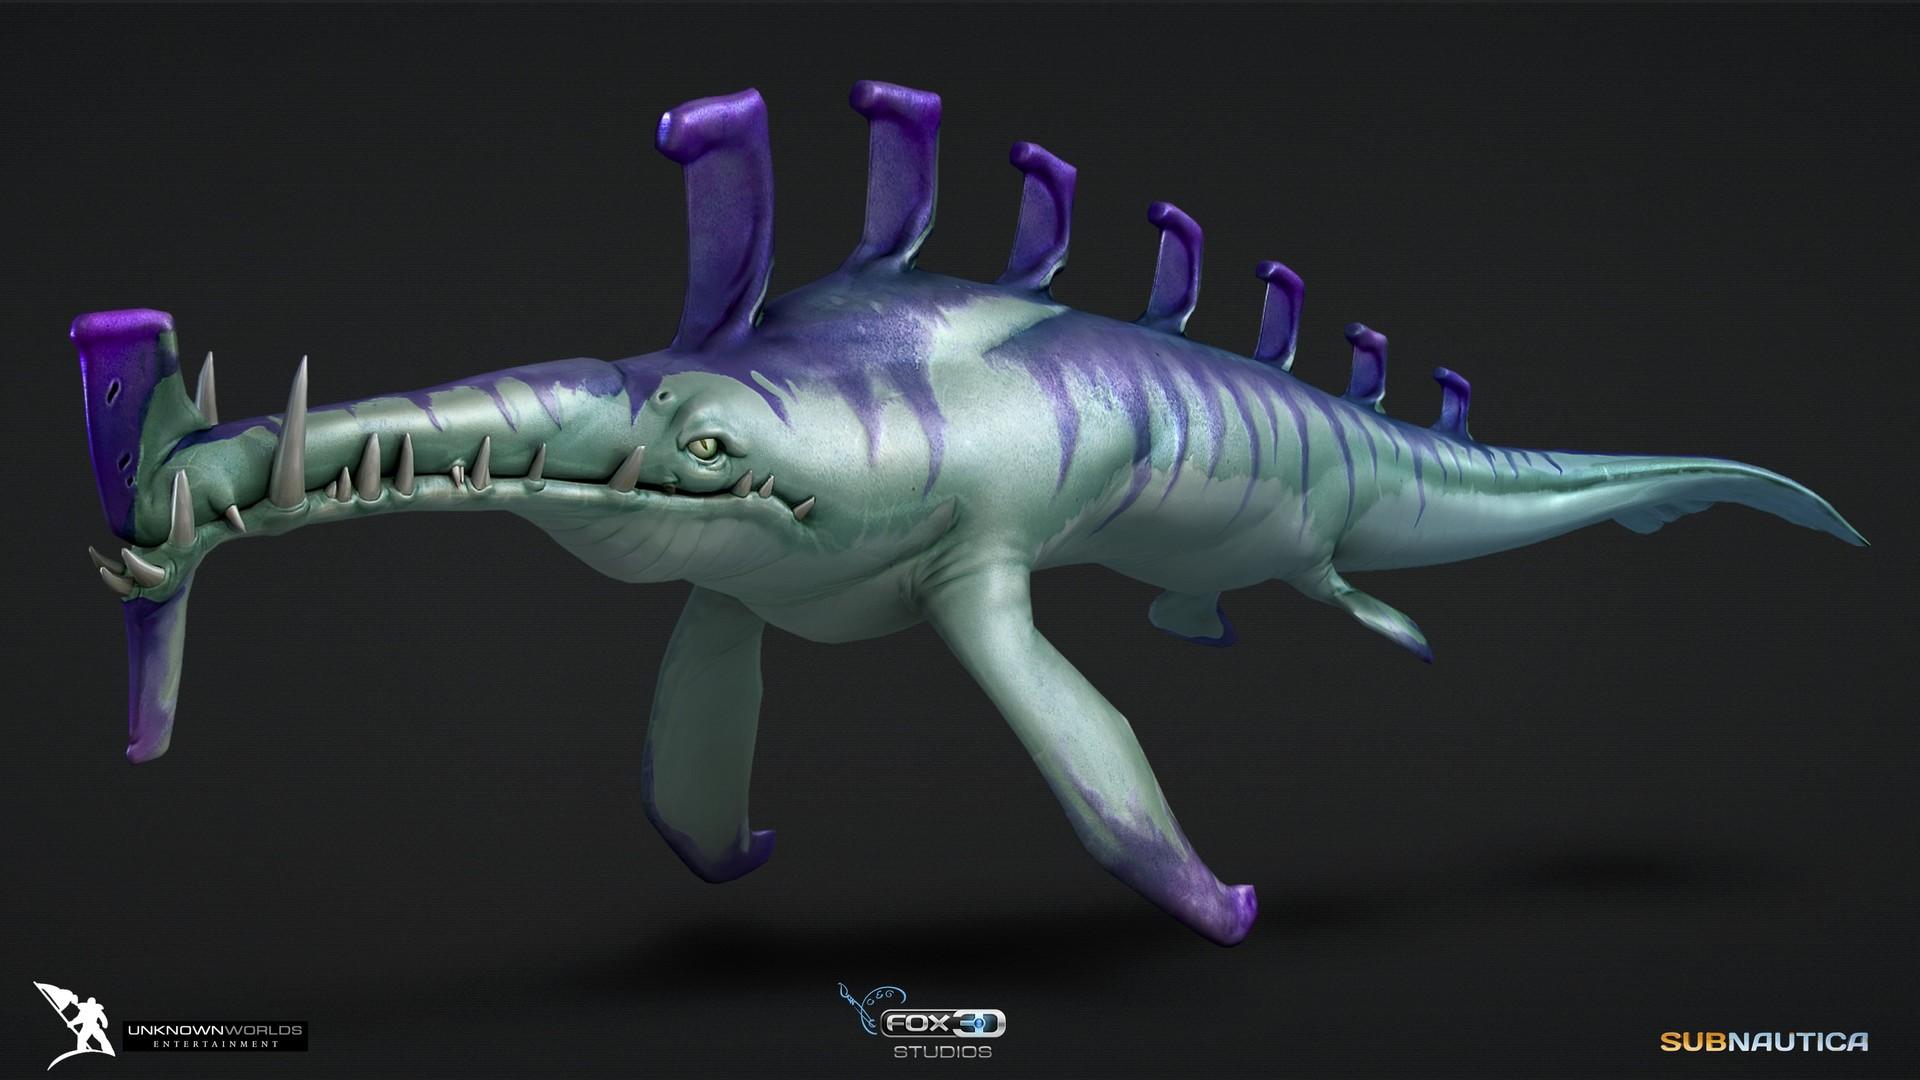 ArtStation - Subnautica, FOX3D ENTERTAINMENT